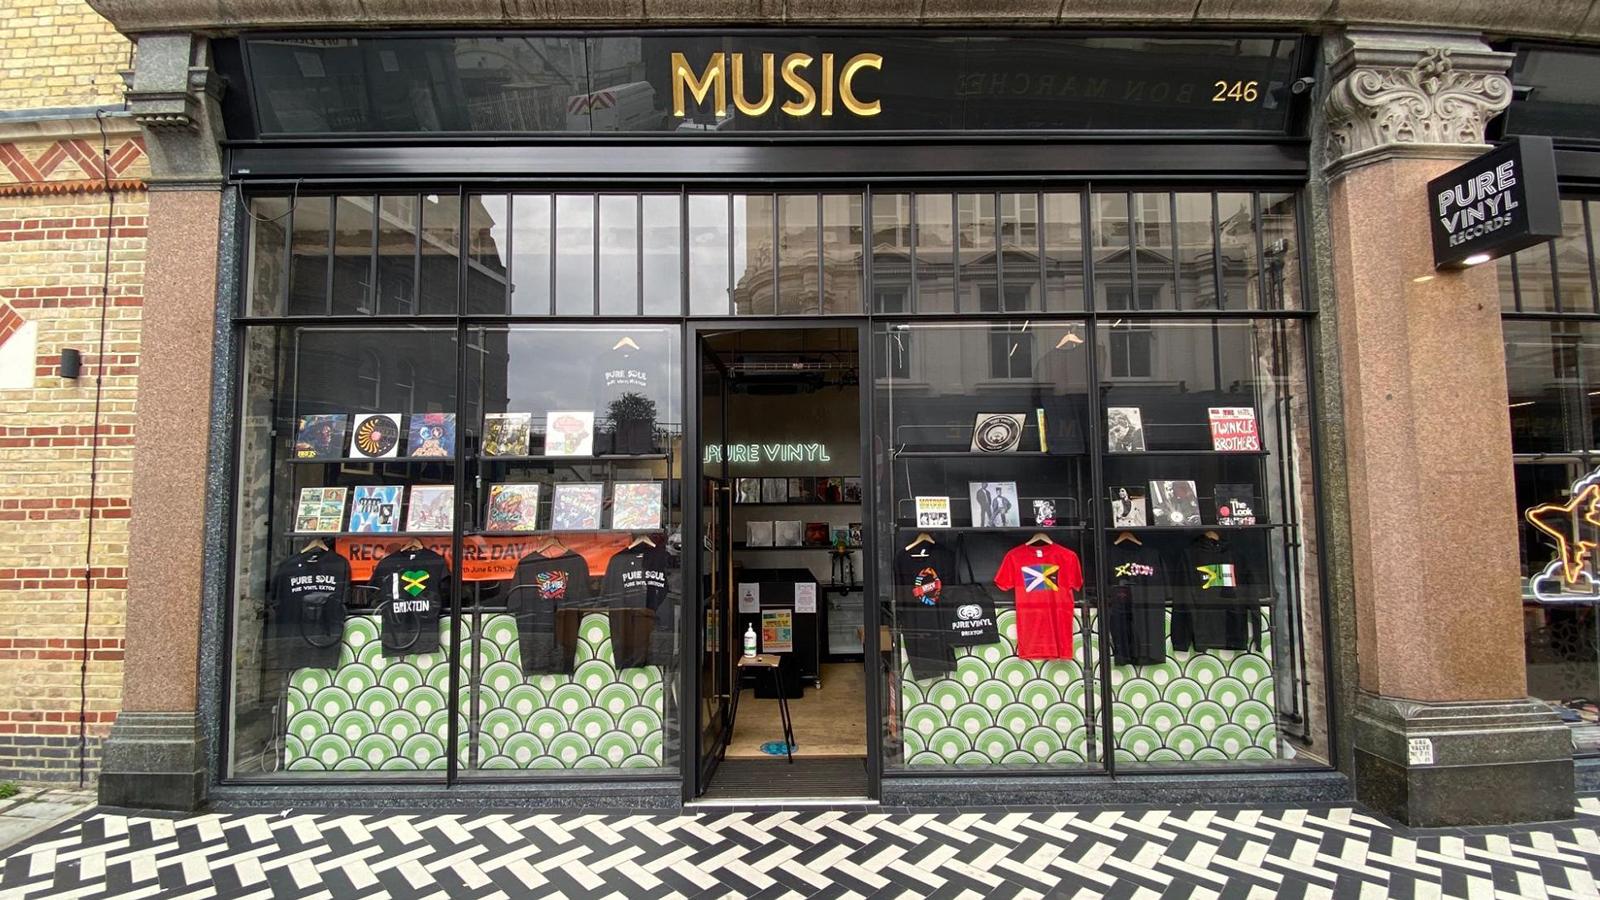 pure vinyl record store london